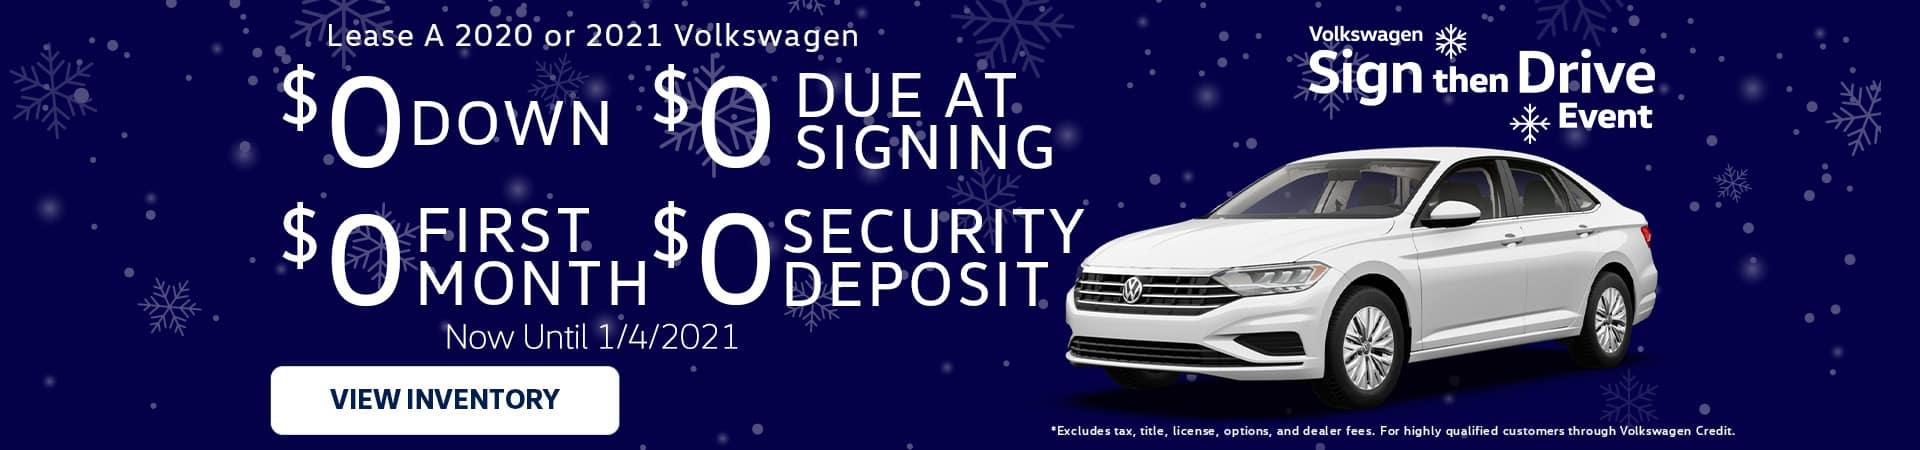 Sign Then Drive December Offer